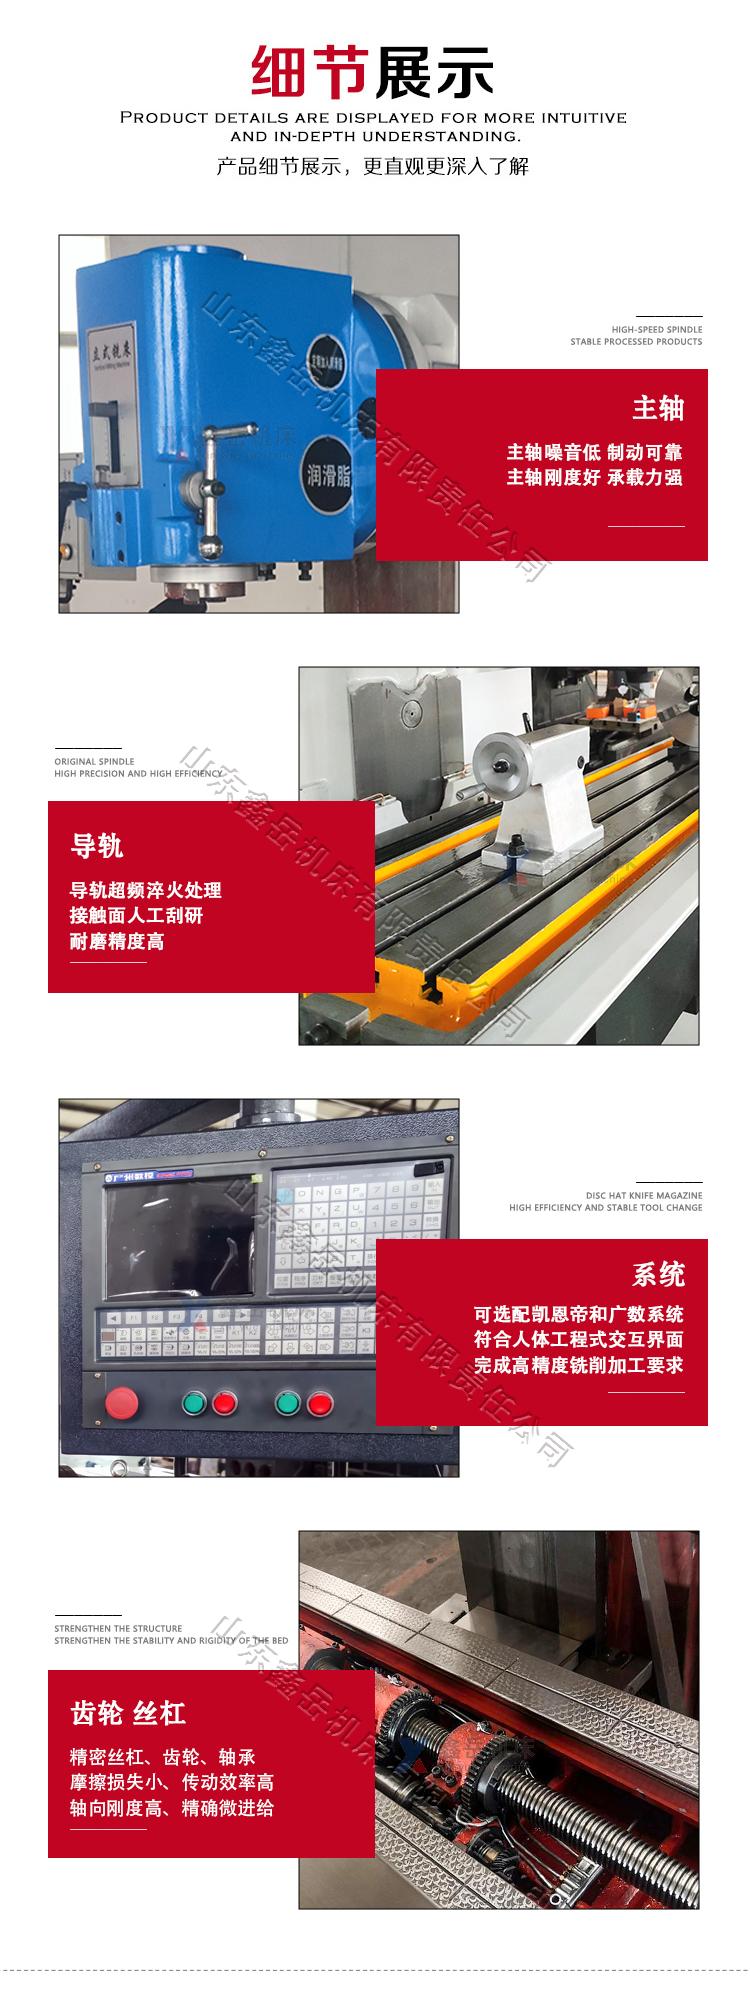 XK5036数控铣床细节图